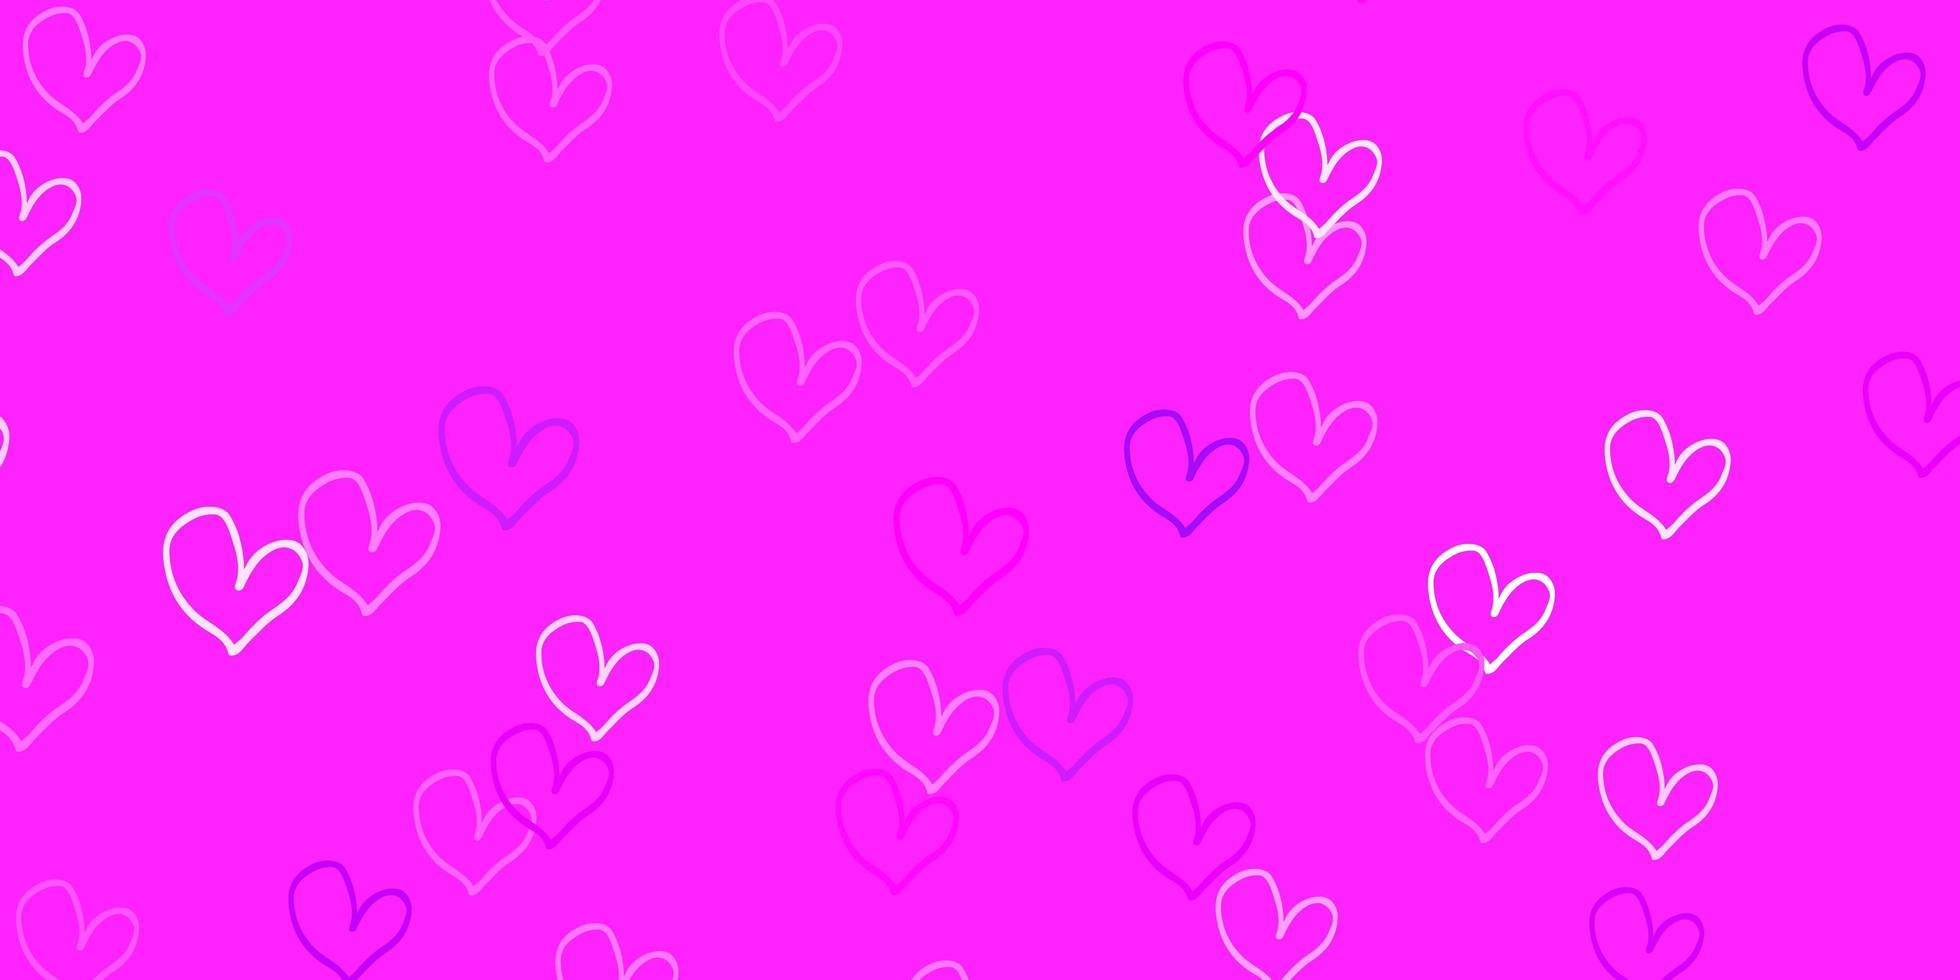 hellviolette, rosa Vektorschablone mit Gekritzelherzen. vektor